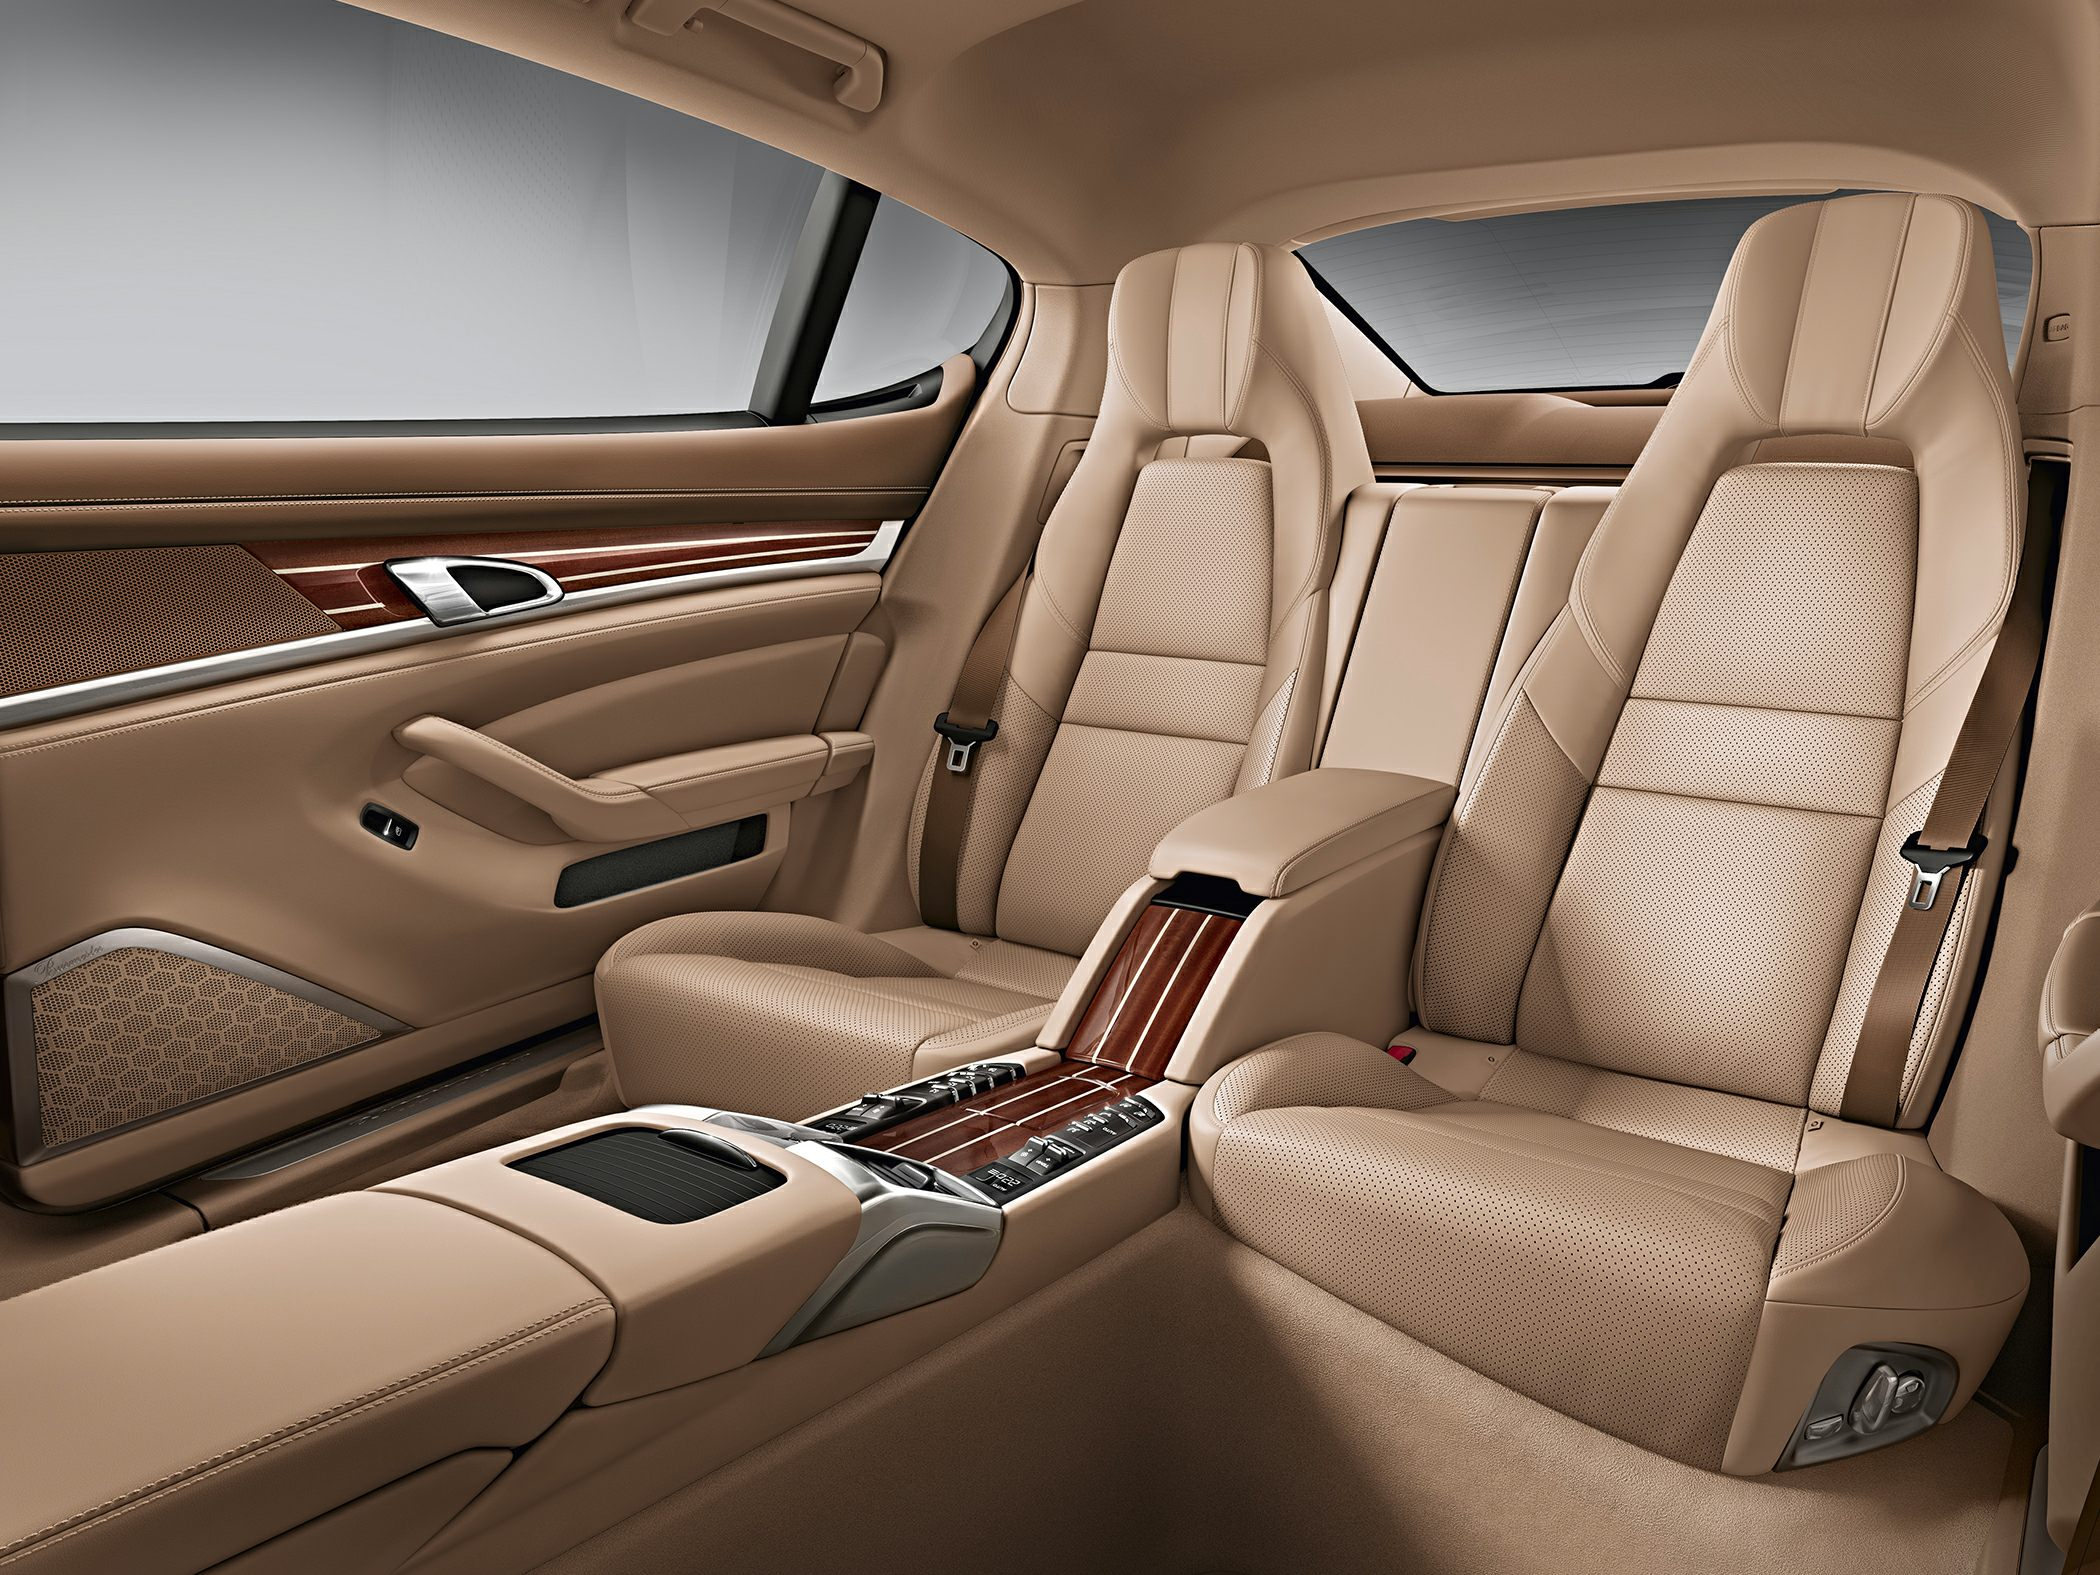 2014 Porsche Panamera Interior2